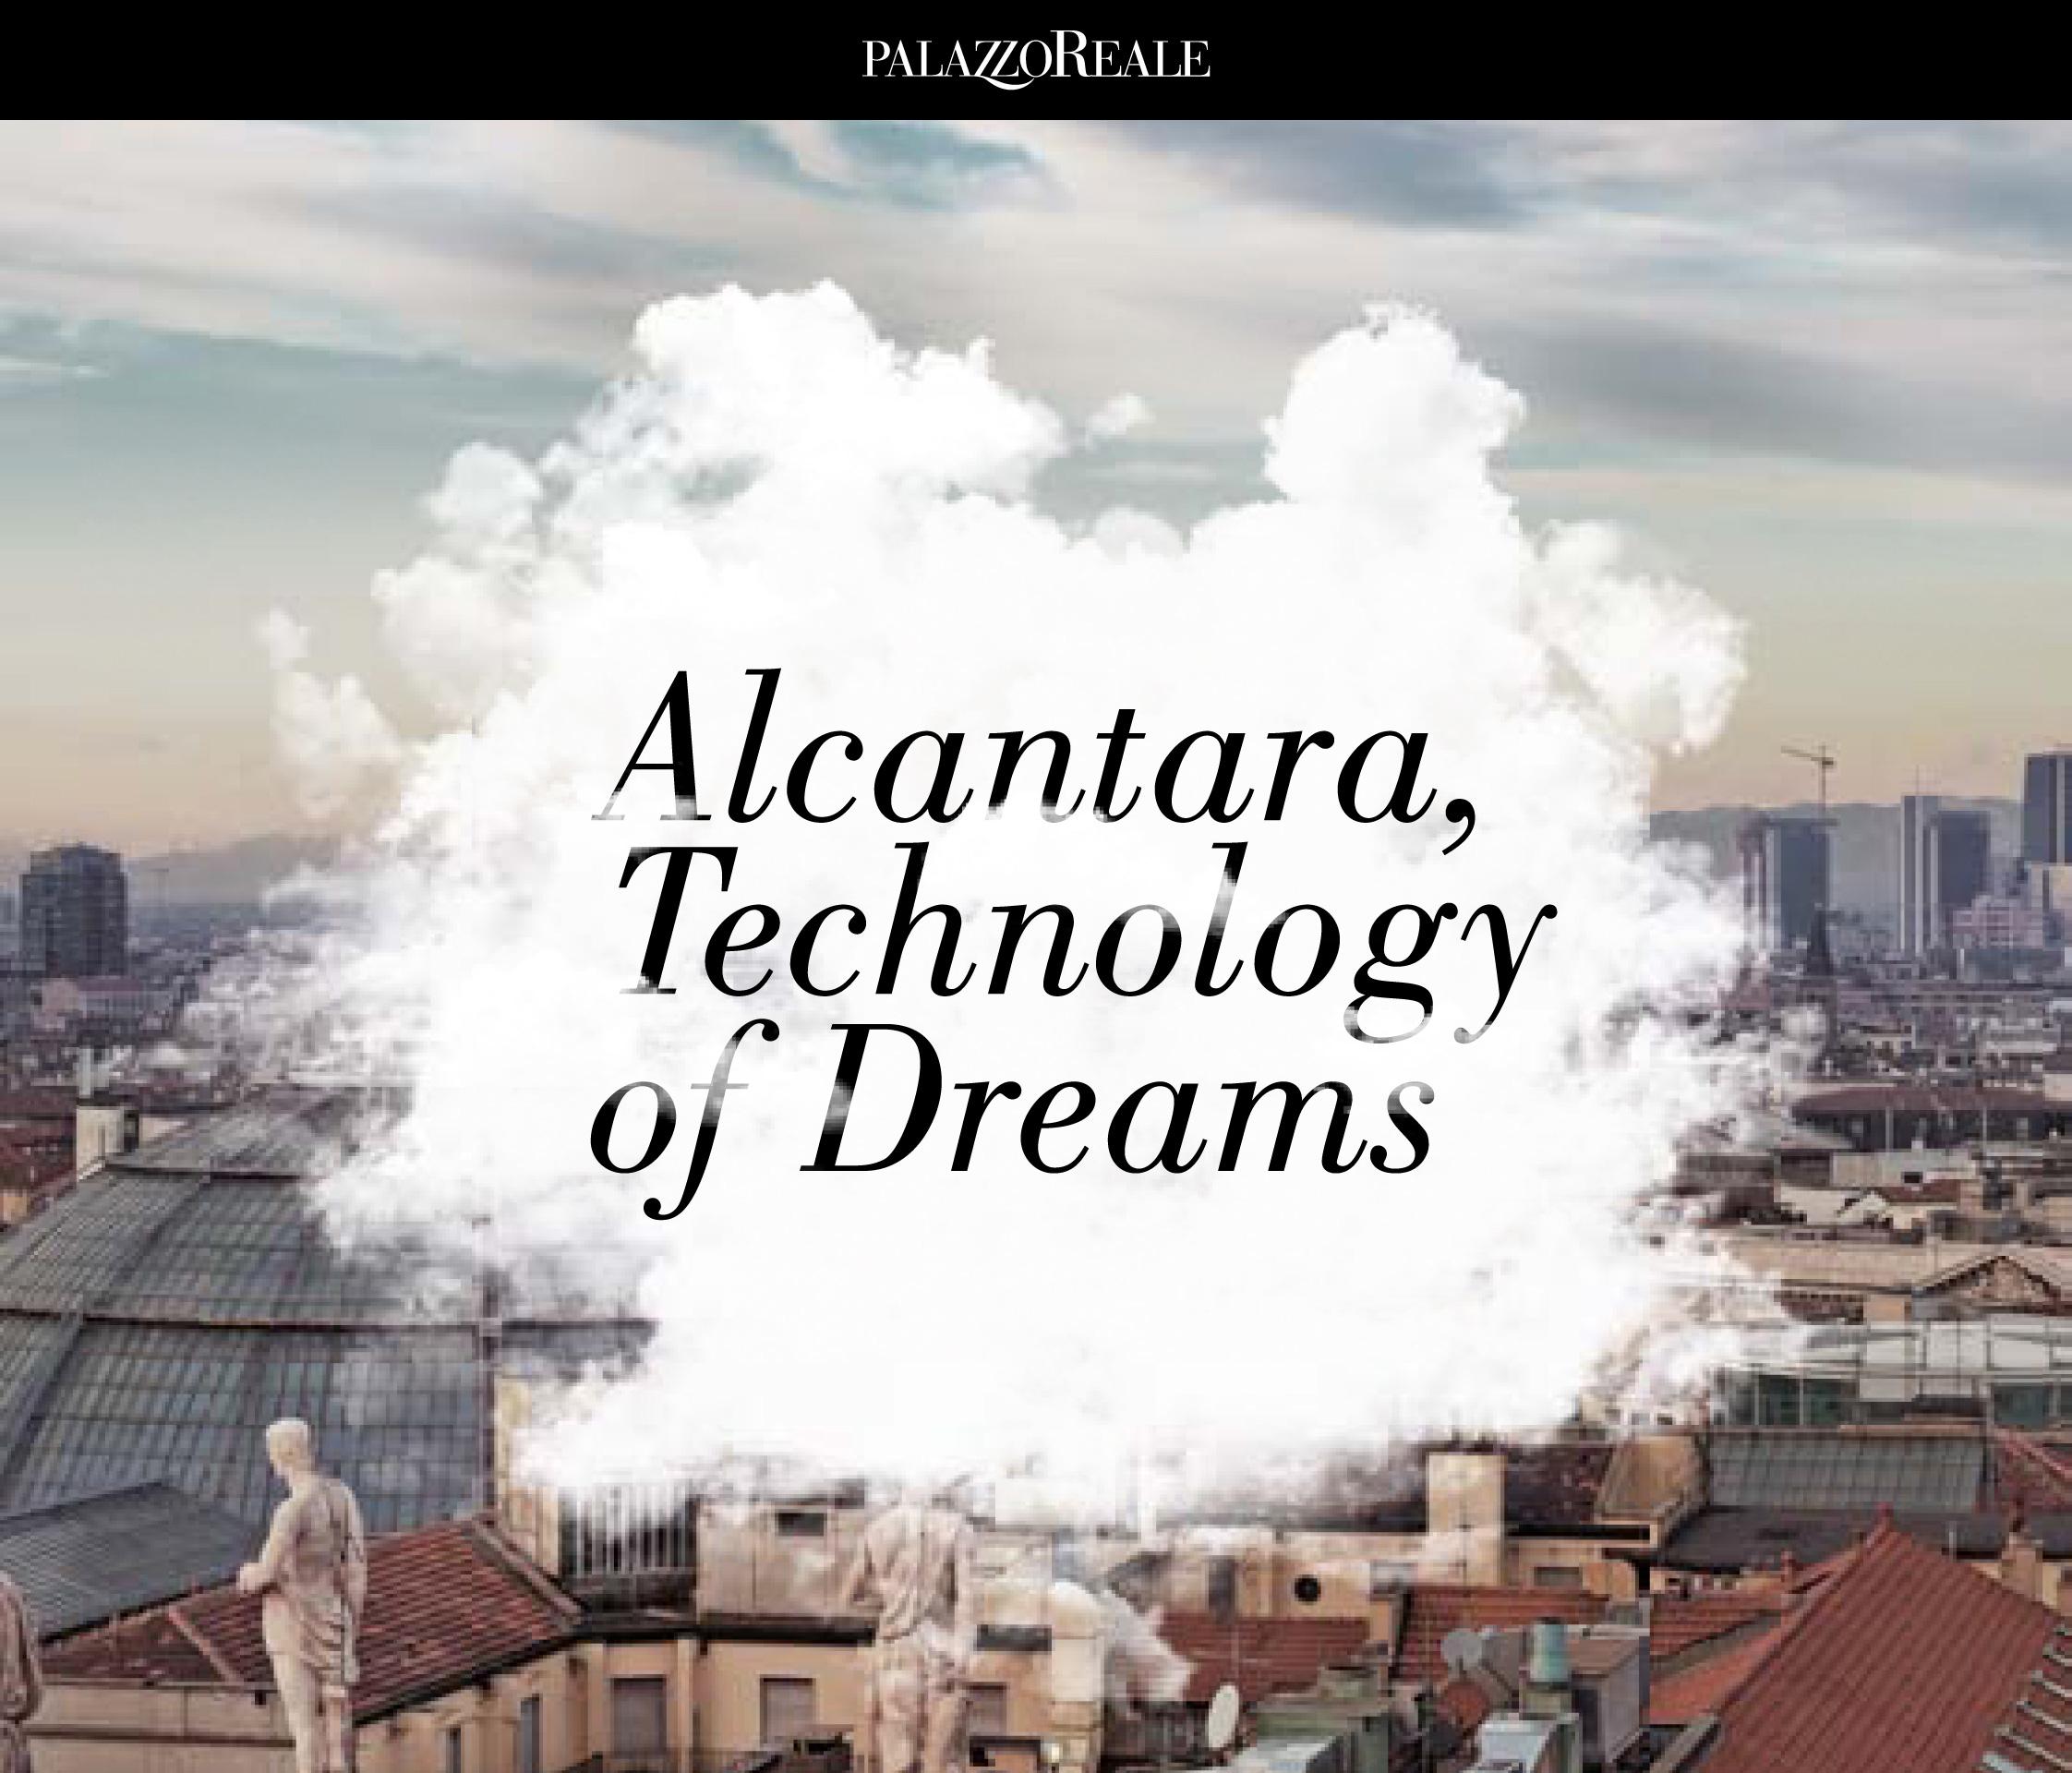 Alcantara, Technology of Dreams